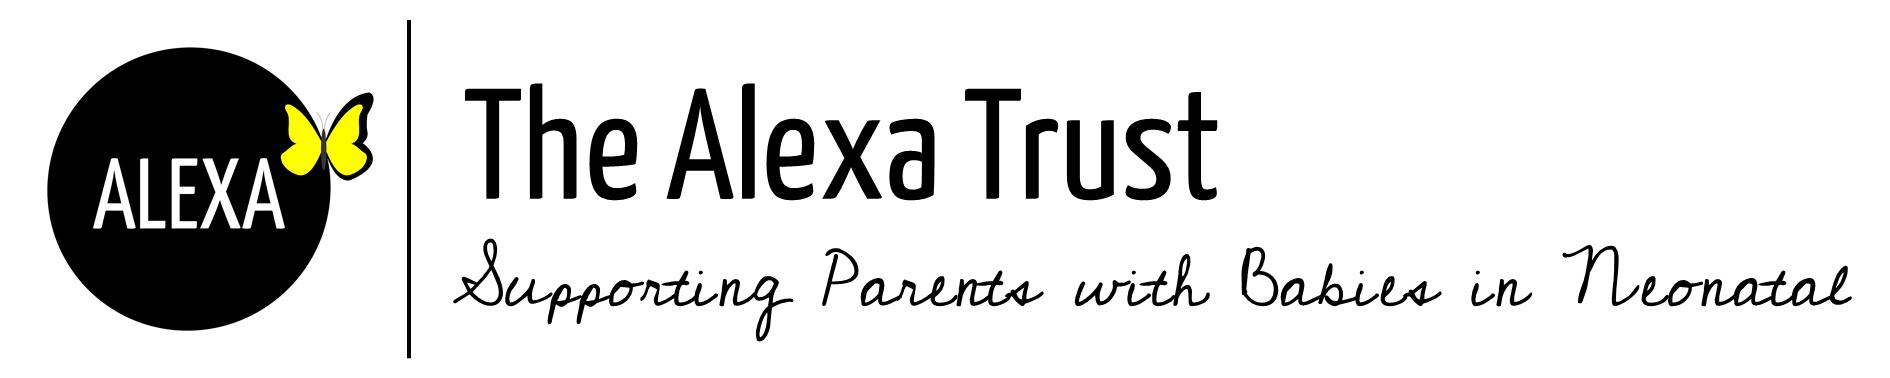 The Alexa Trust